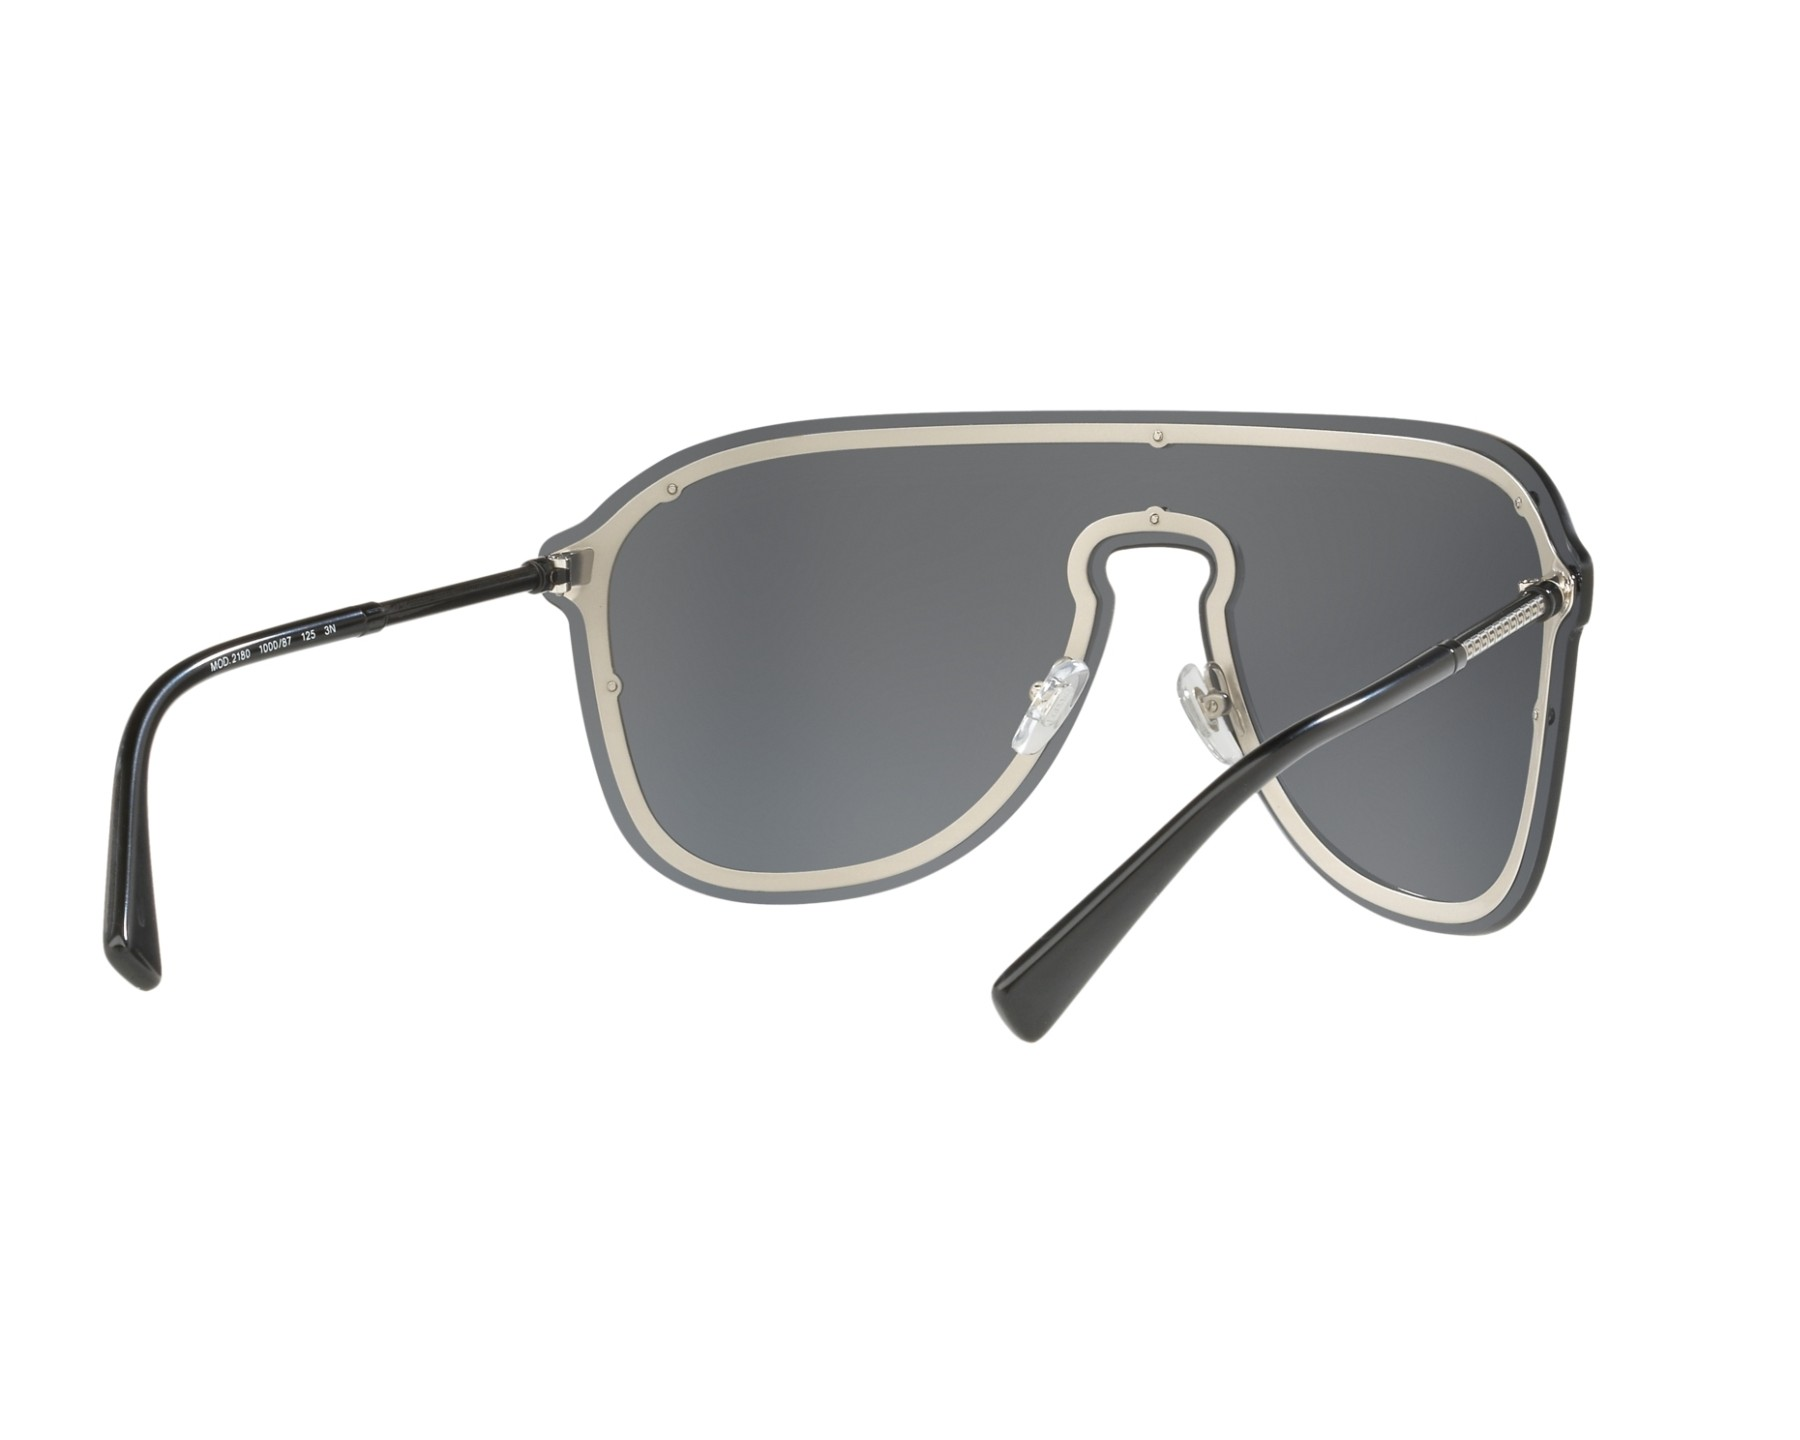 69c4835951 Sunglasses Versace VE-2180 100087 44- Black 360 degree view 8